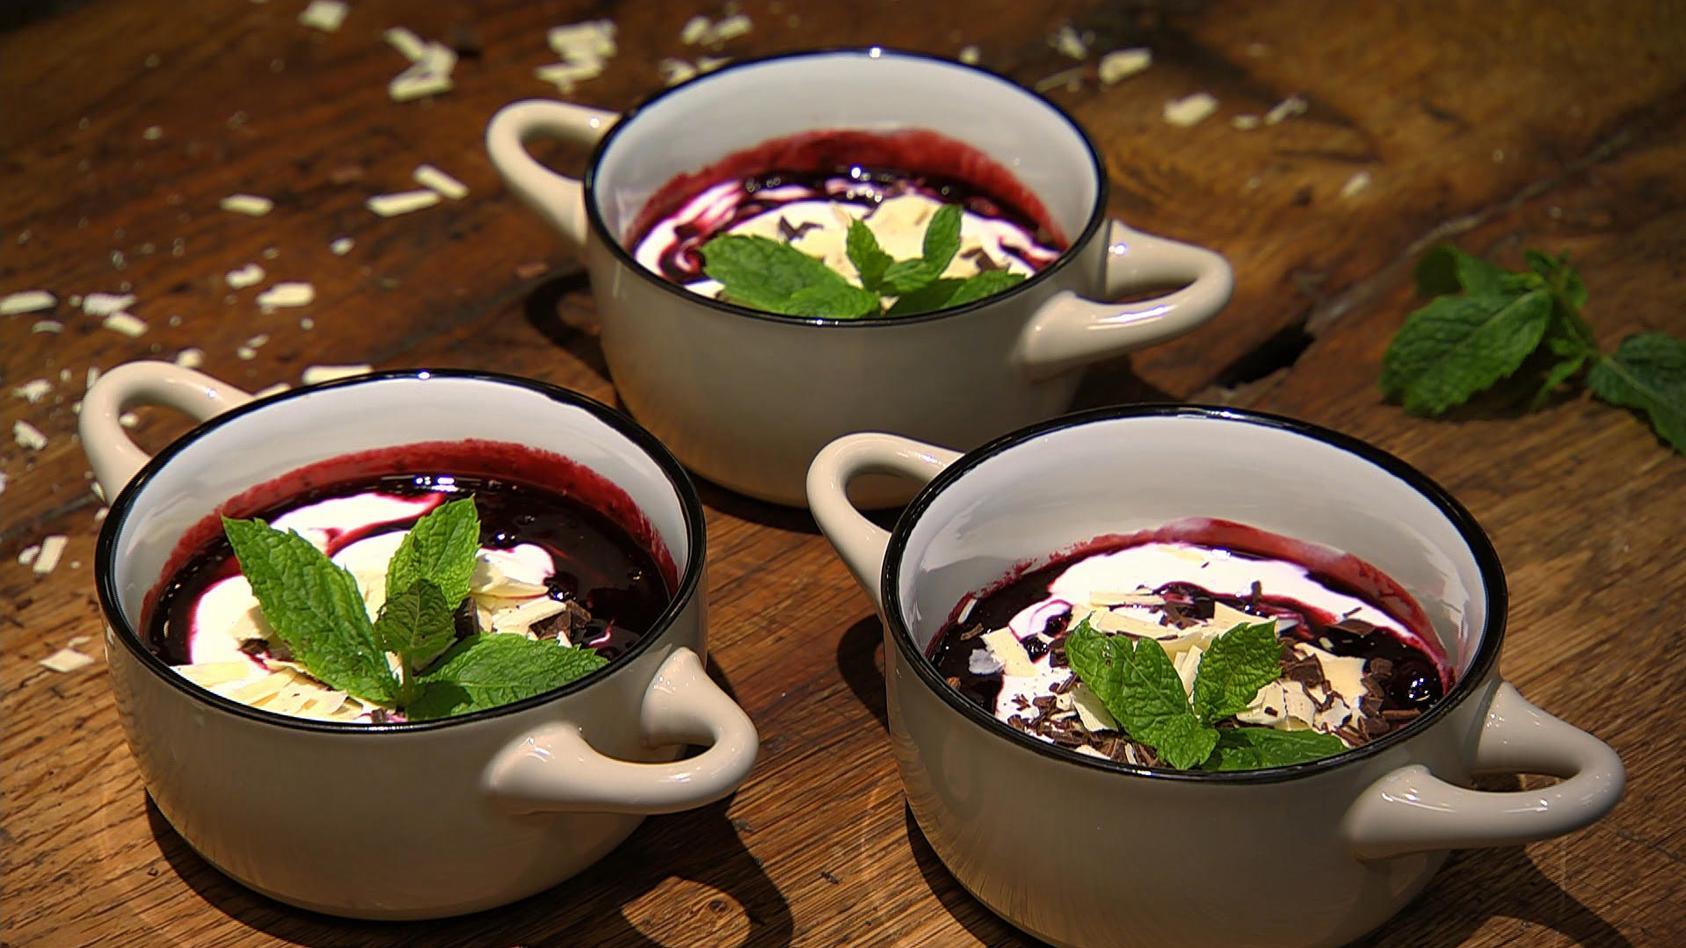 Grüne Kräuterküche: Heidelbeer-Rosmarin-Joghurt